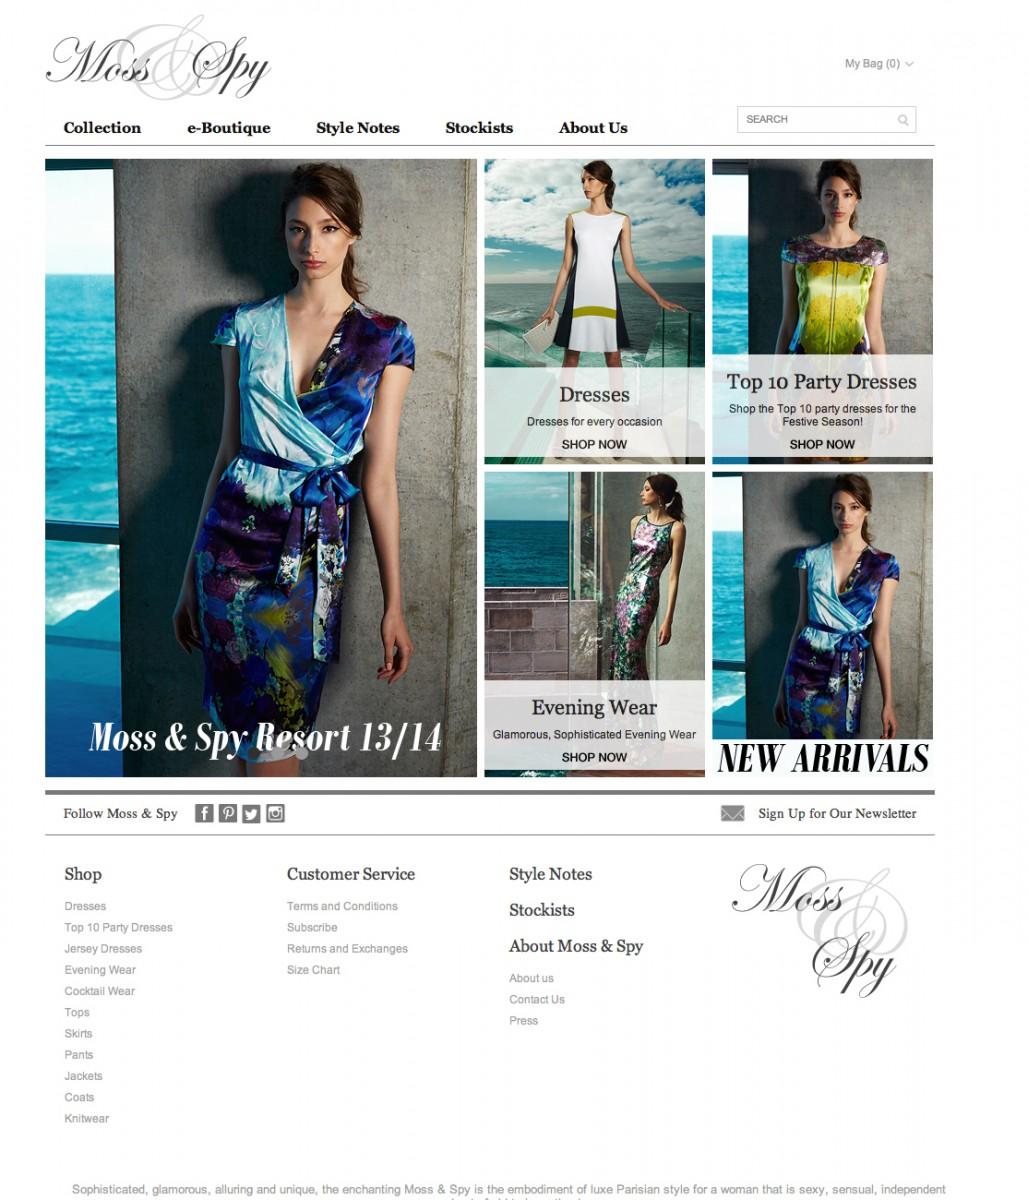 MOSS & SPY'S WEB SITE